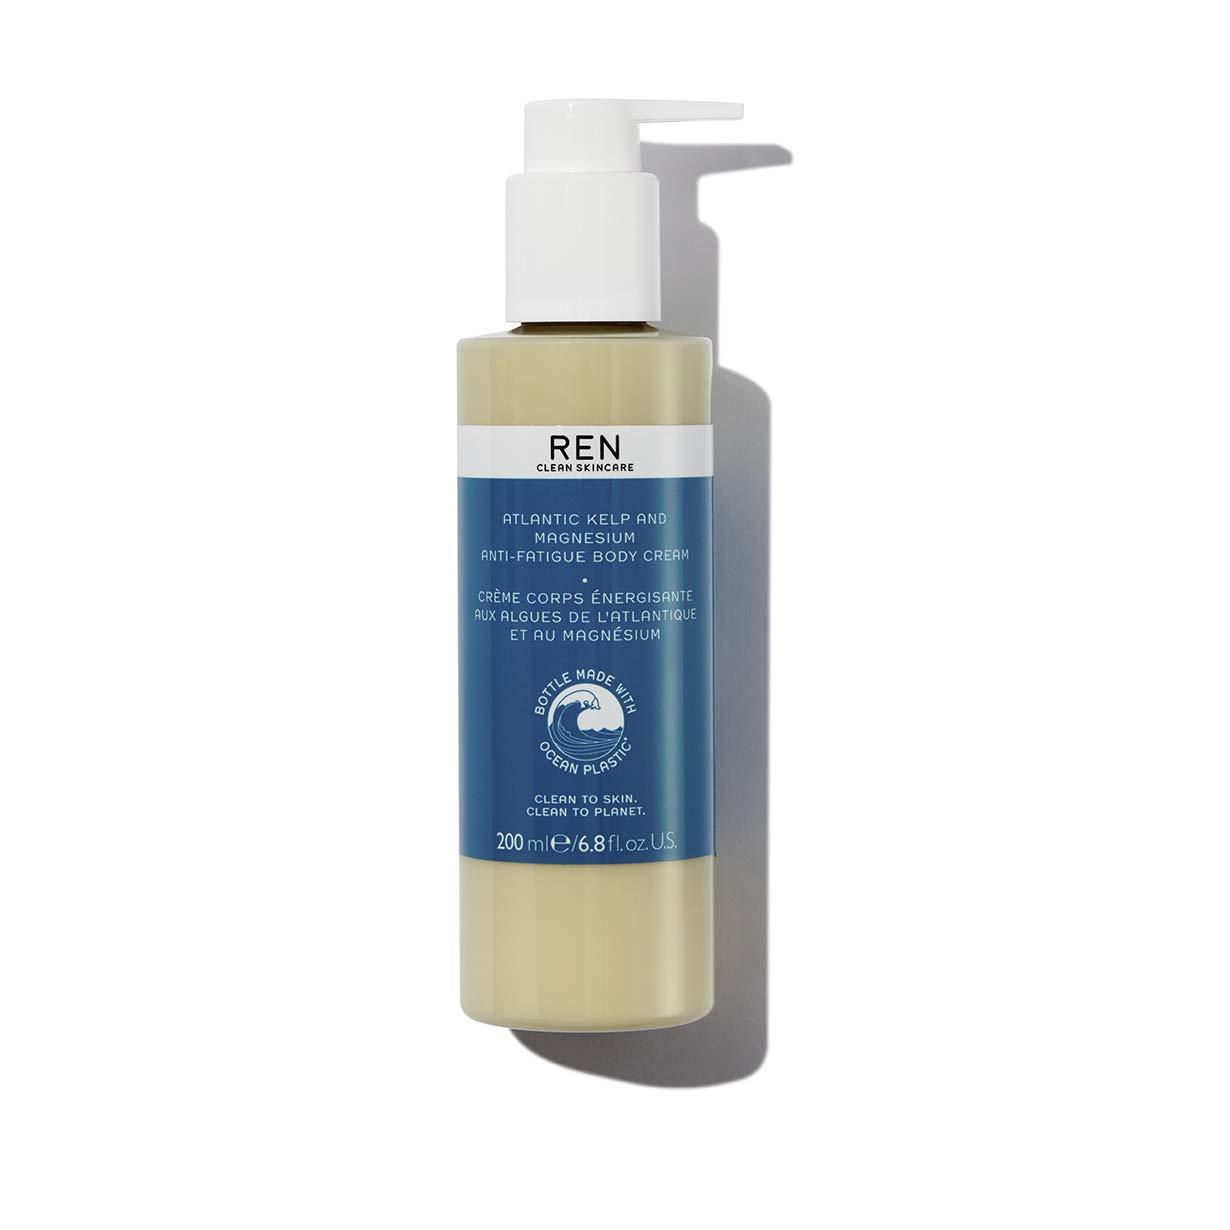 REN Clean Skincare Atlantic Kelp & Magnesium Anti-Fatigue Body Cream Hydrating Body Moisturizer Packaged in Recycled Ocean Plastic Bottle, 6.8 Fl Oz